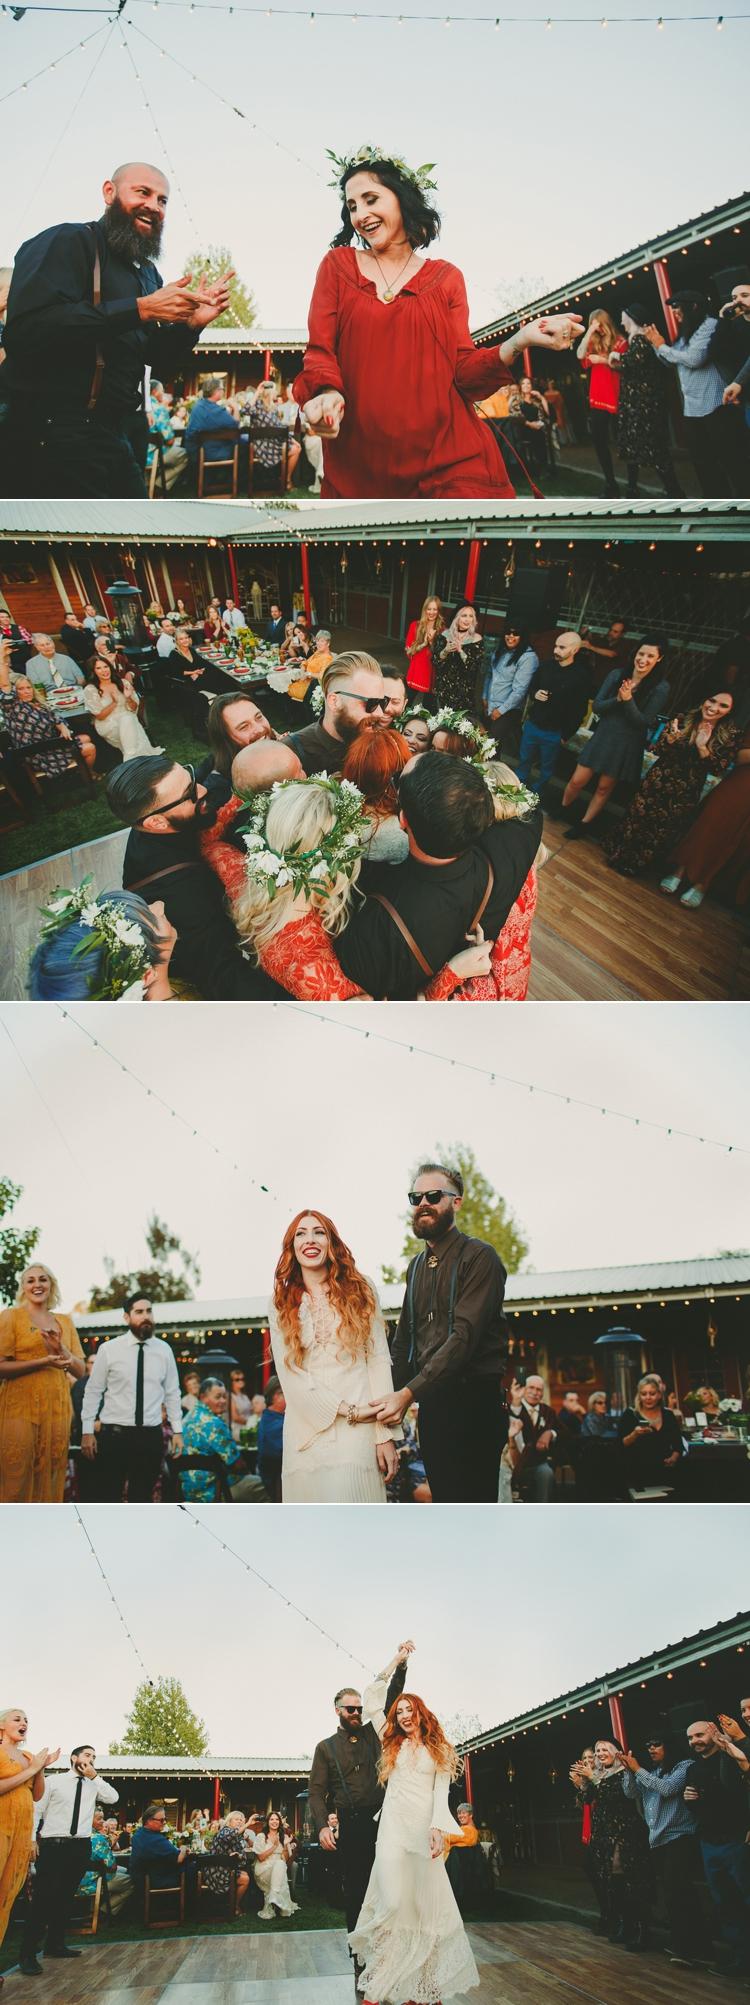 woodstock-inspired-wedding-photos-28